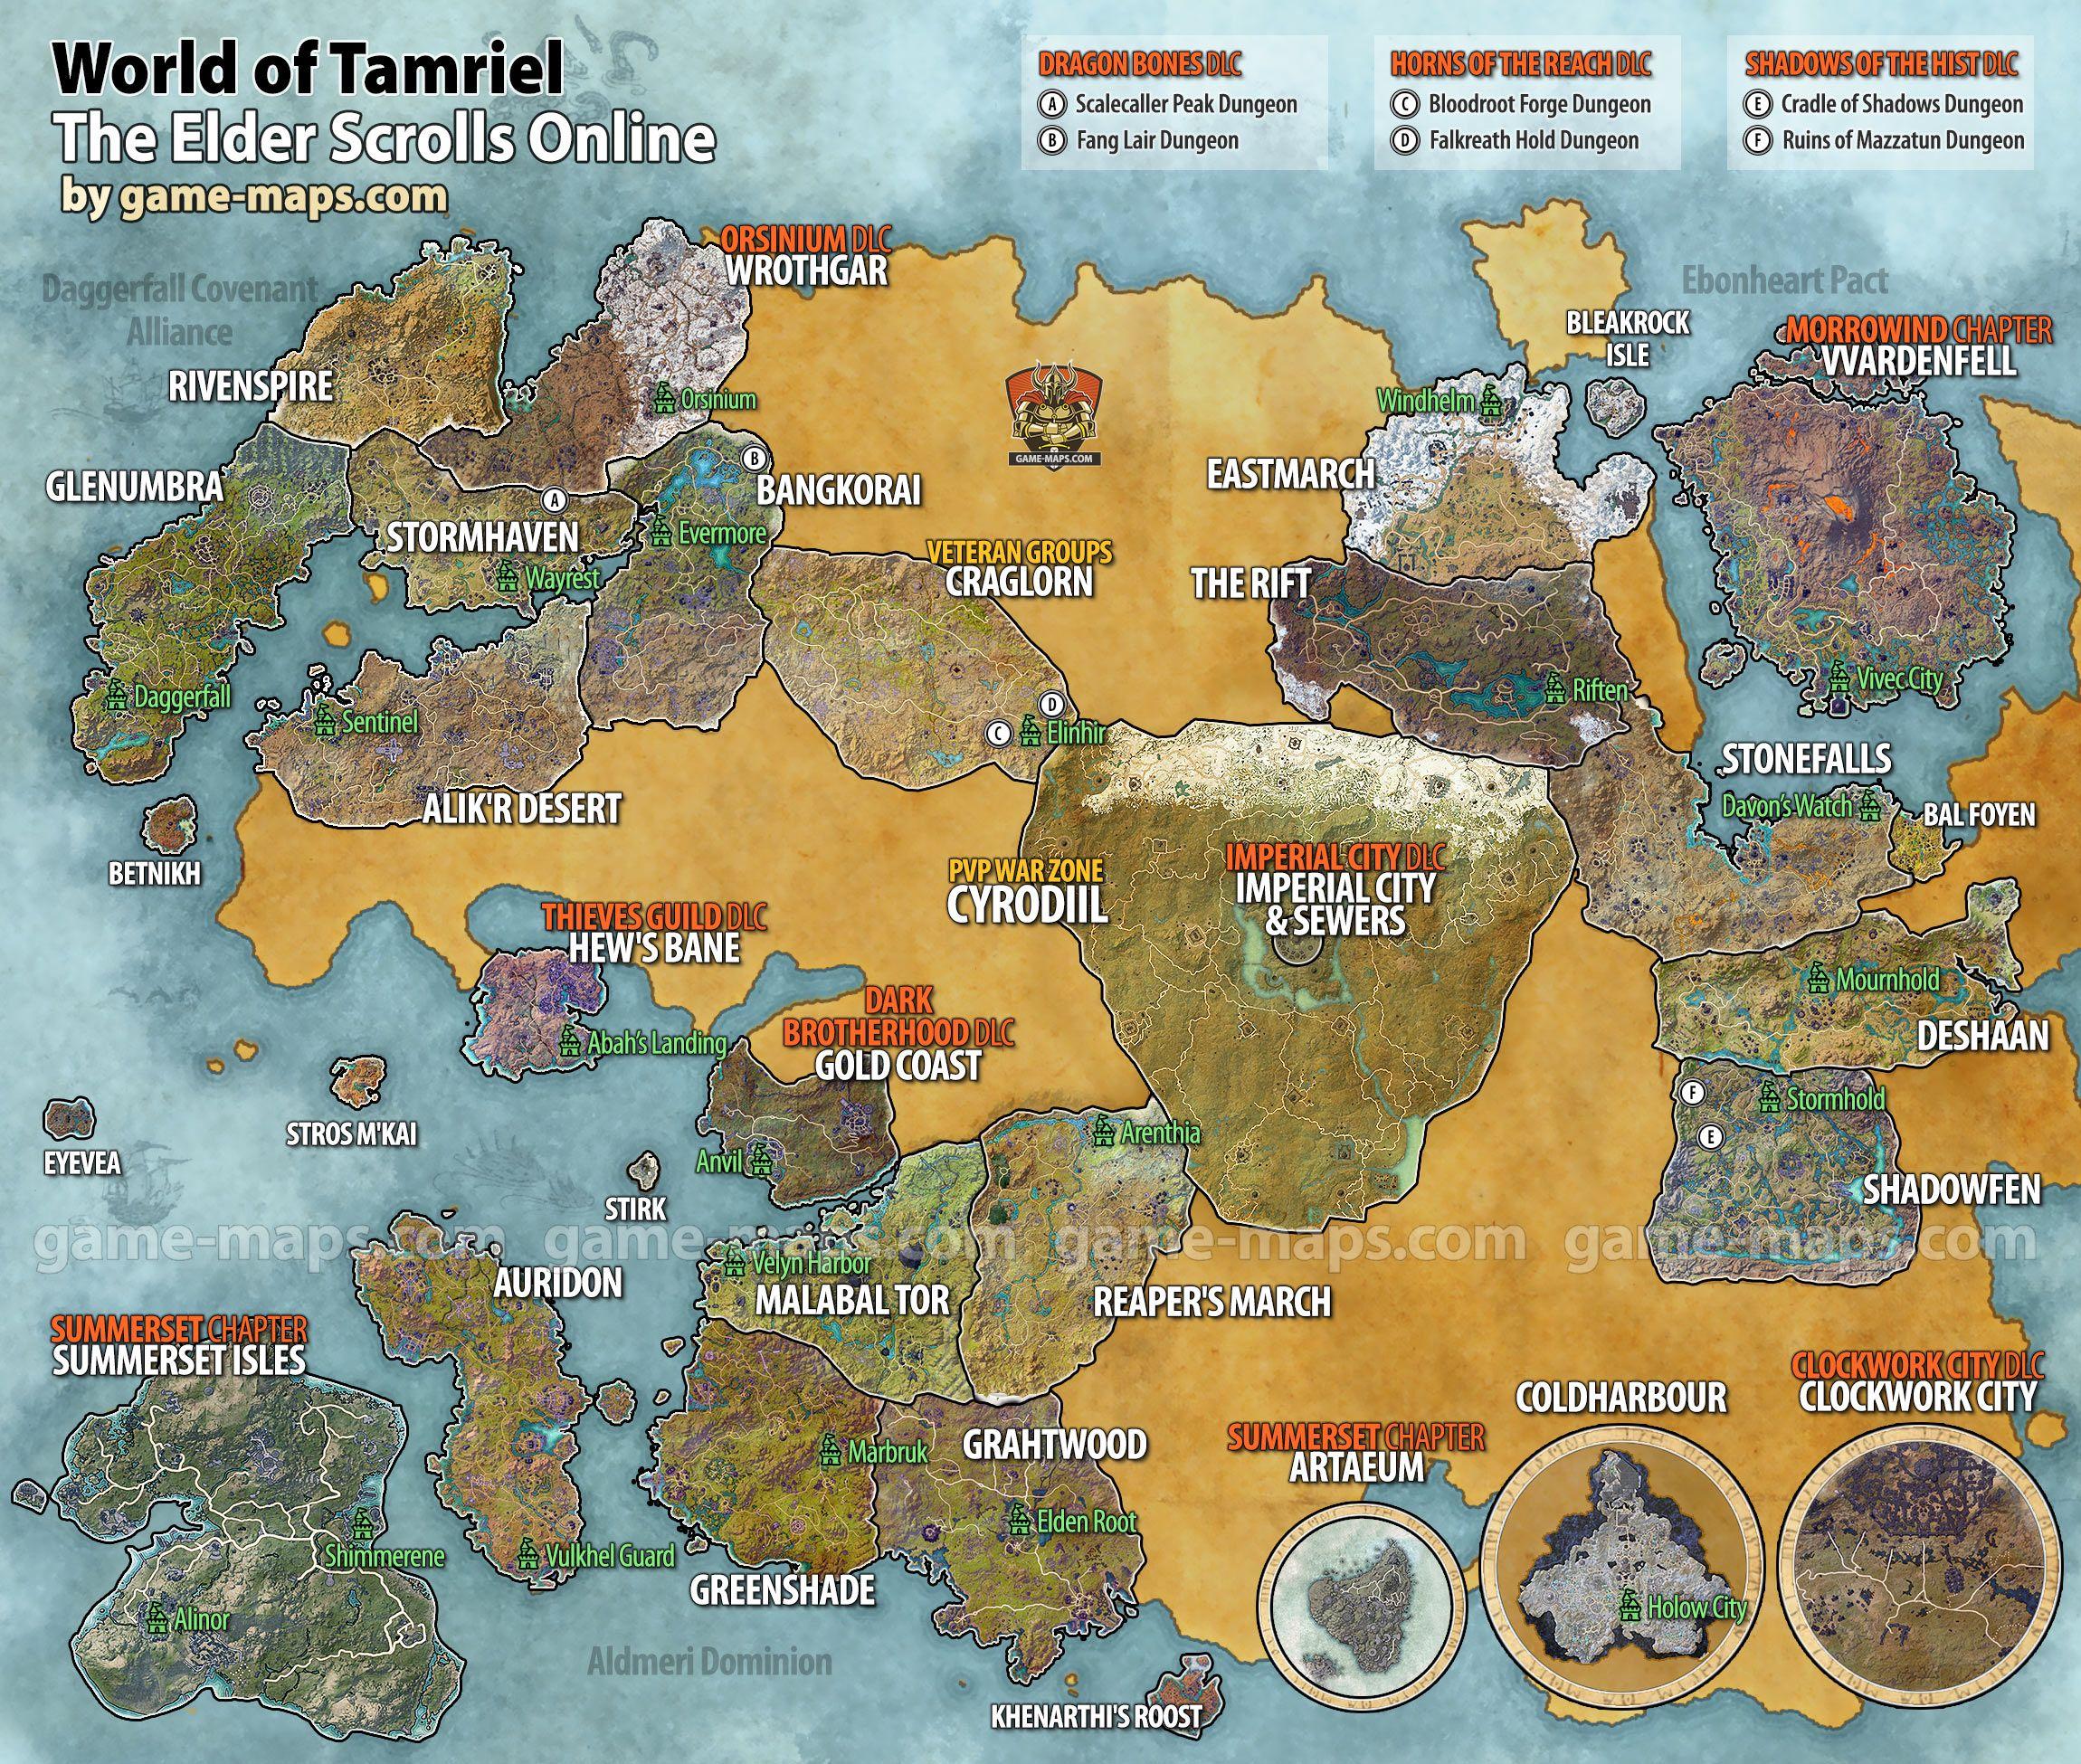 Elder Scrolls Online World Map Maps for The Elder Scrolls Online (ESO), Vvardenfell, Morrowind